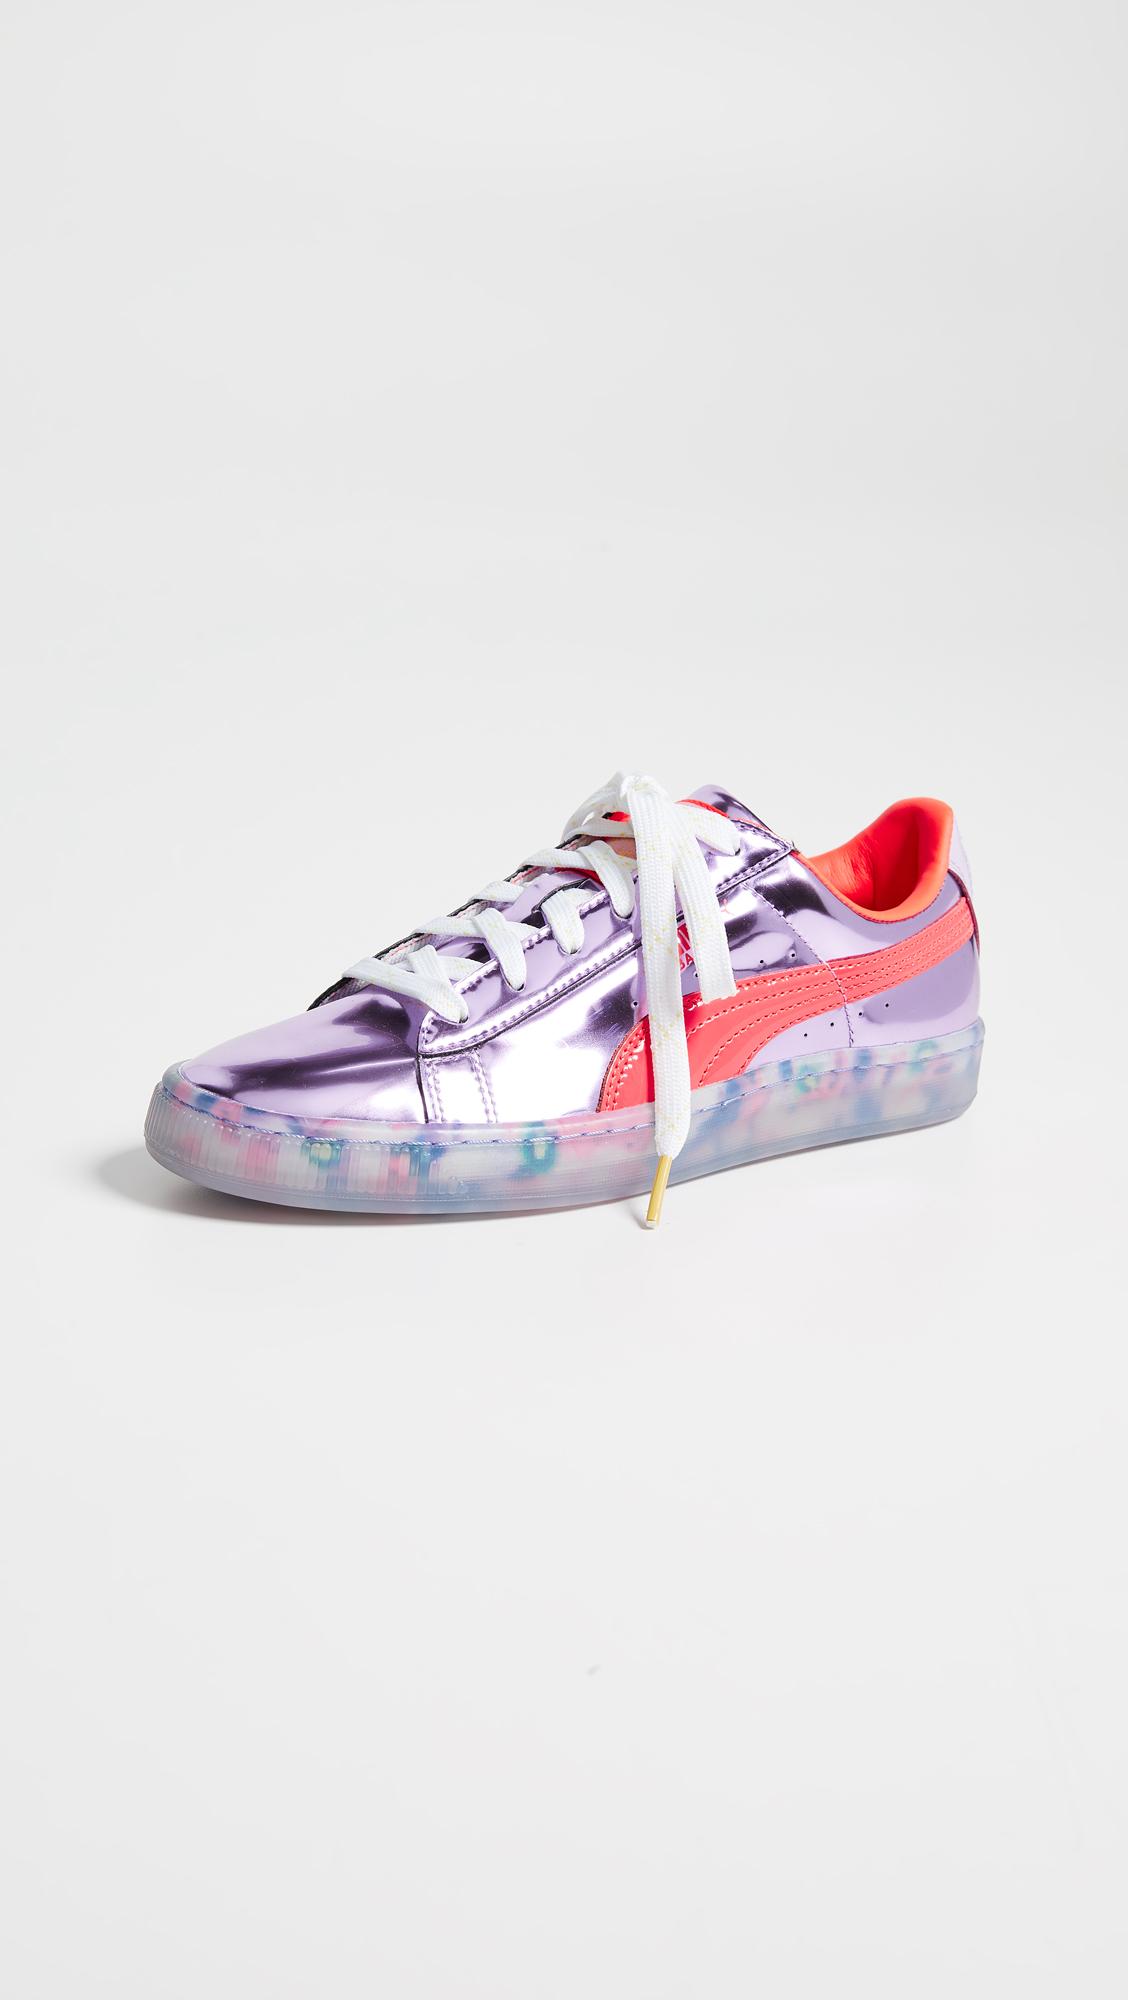 5d66a3d6e57b PUMA x Sophia Webster Basket Candy Princess Sneakers